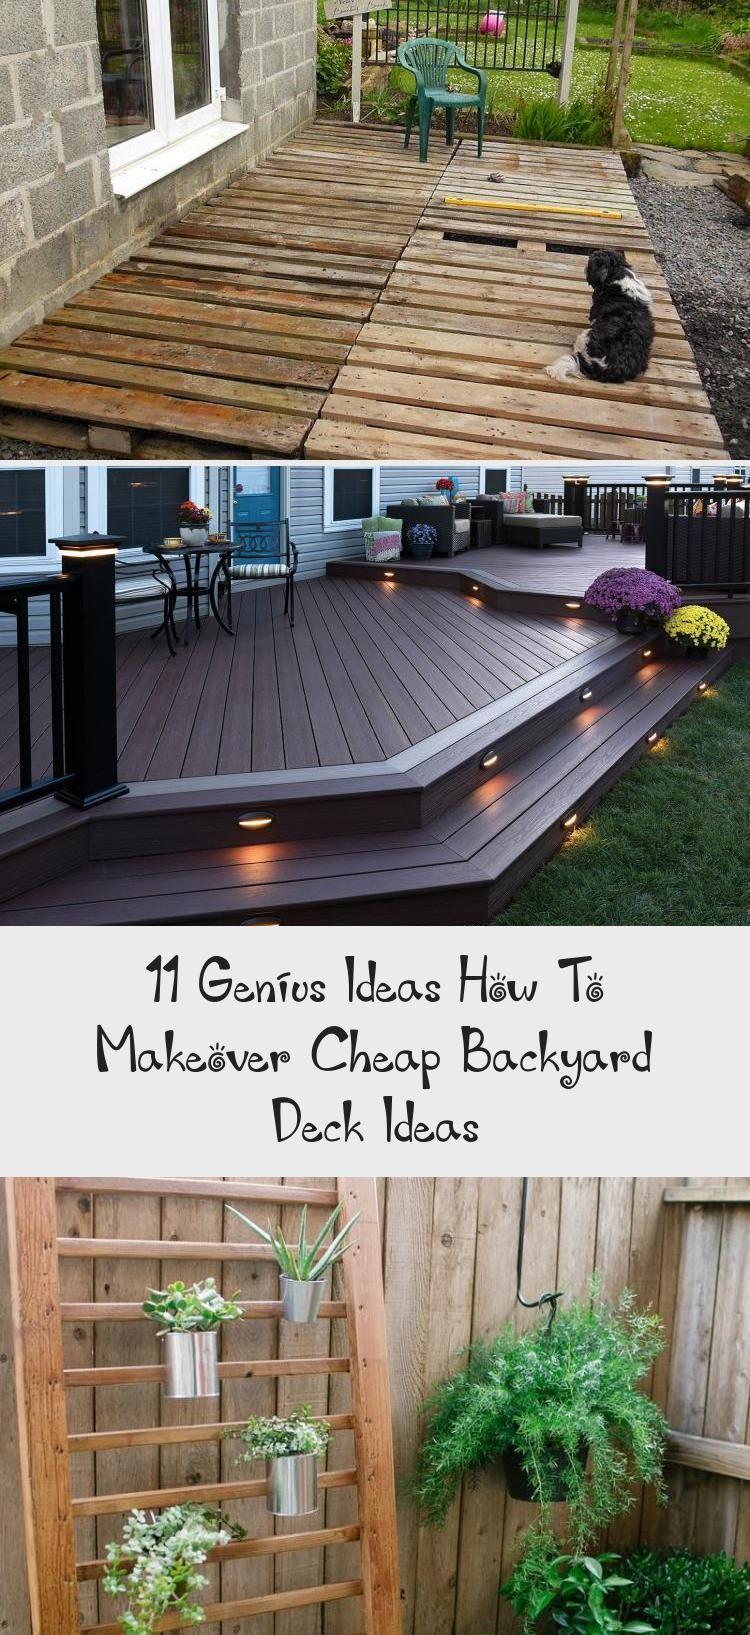 11 Genius Ideas How To Makeover Cheap Backyard Deck Ideas Backyard Cheap Deck Genius Ideas Makeover Backyard Makeover Cheap Backyard Decks Backyard